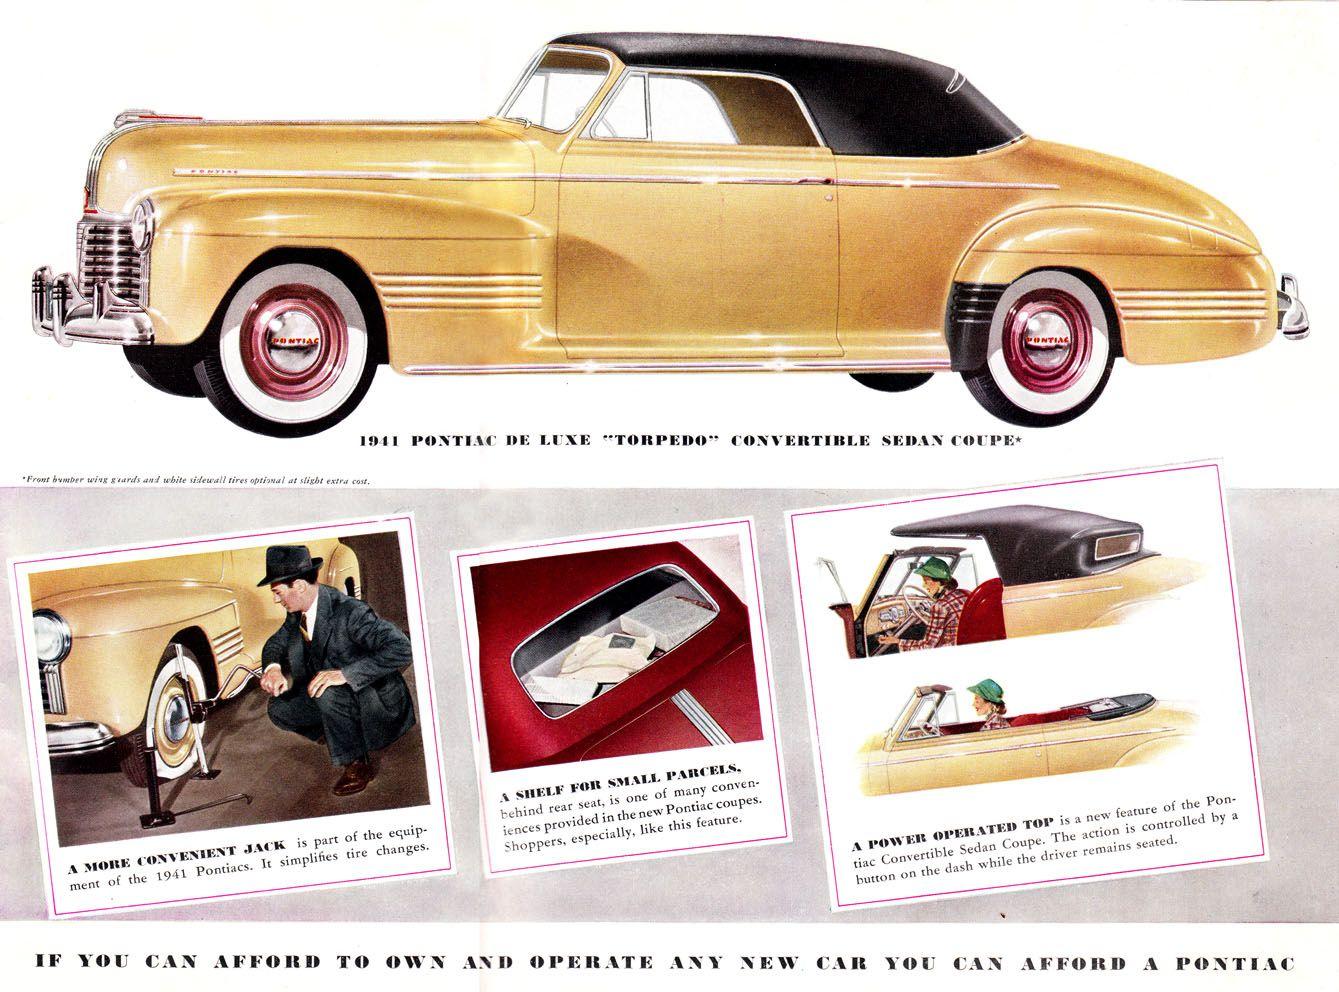 1941 Pontiac Deluxe Torpedo Convertible Sedan Coupe